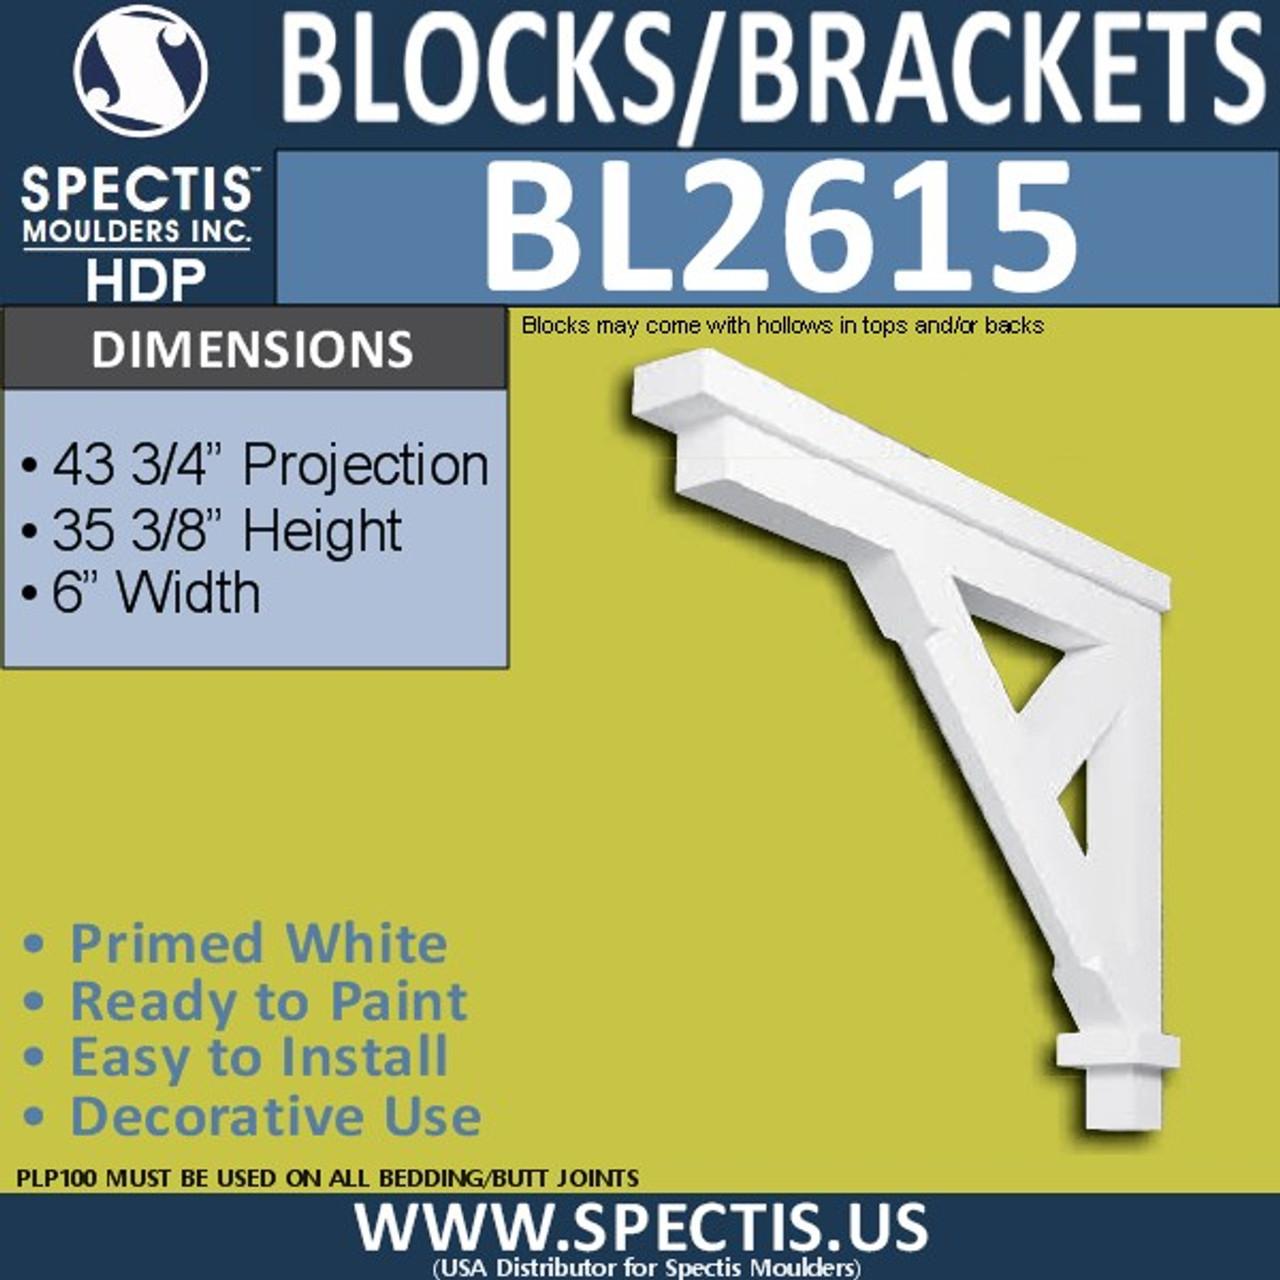 "BL2615 Eave Block or Bracket 6""W x 35.4""H x 43.75"" P"